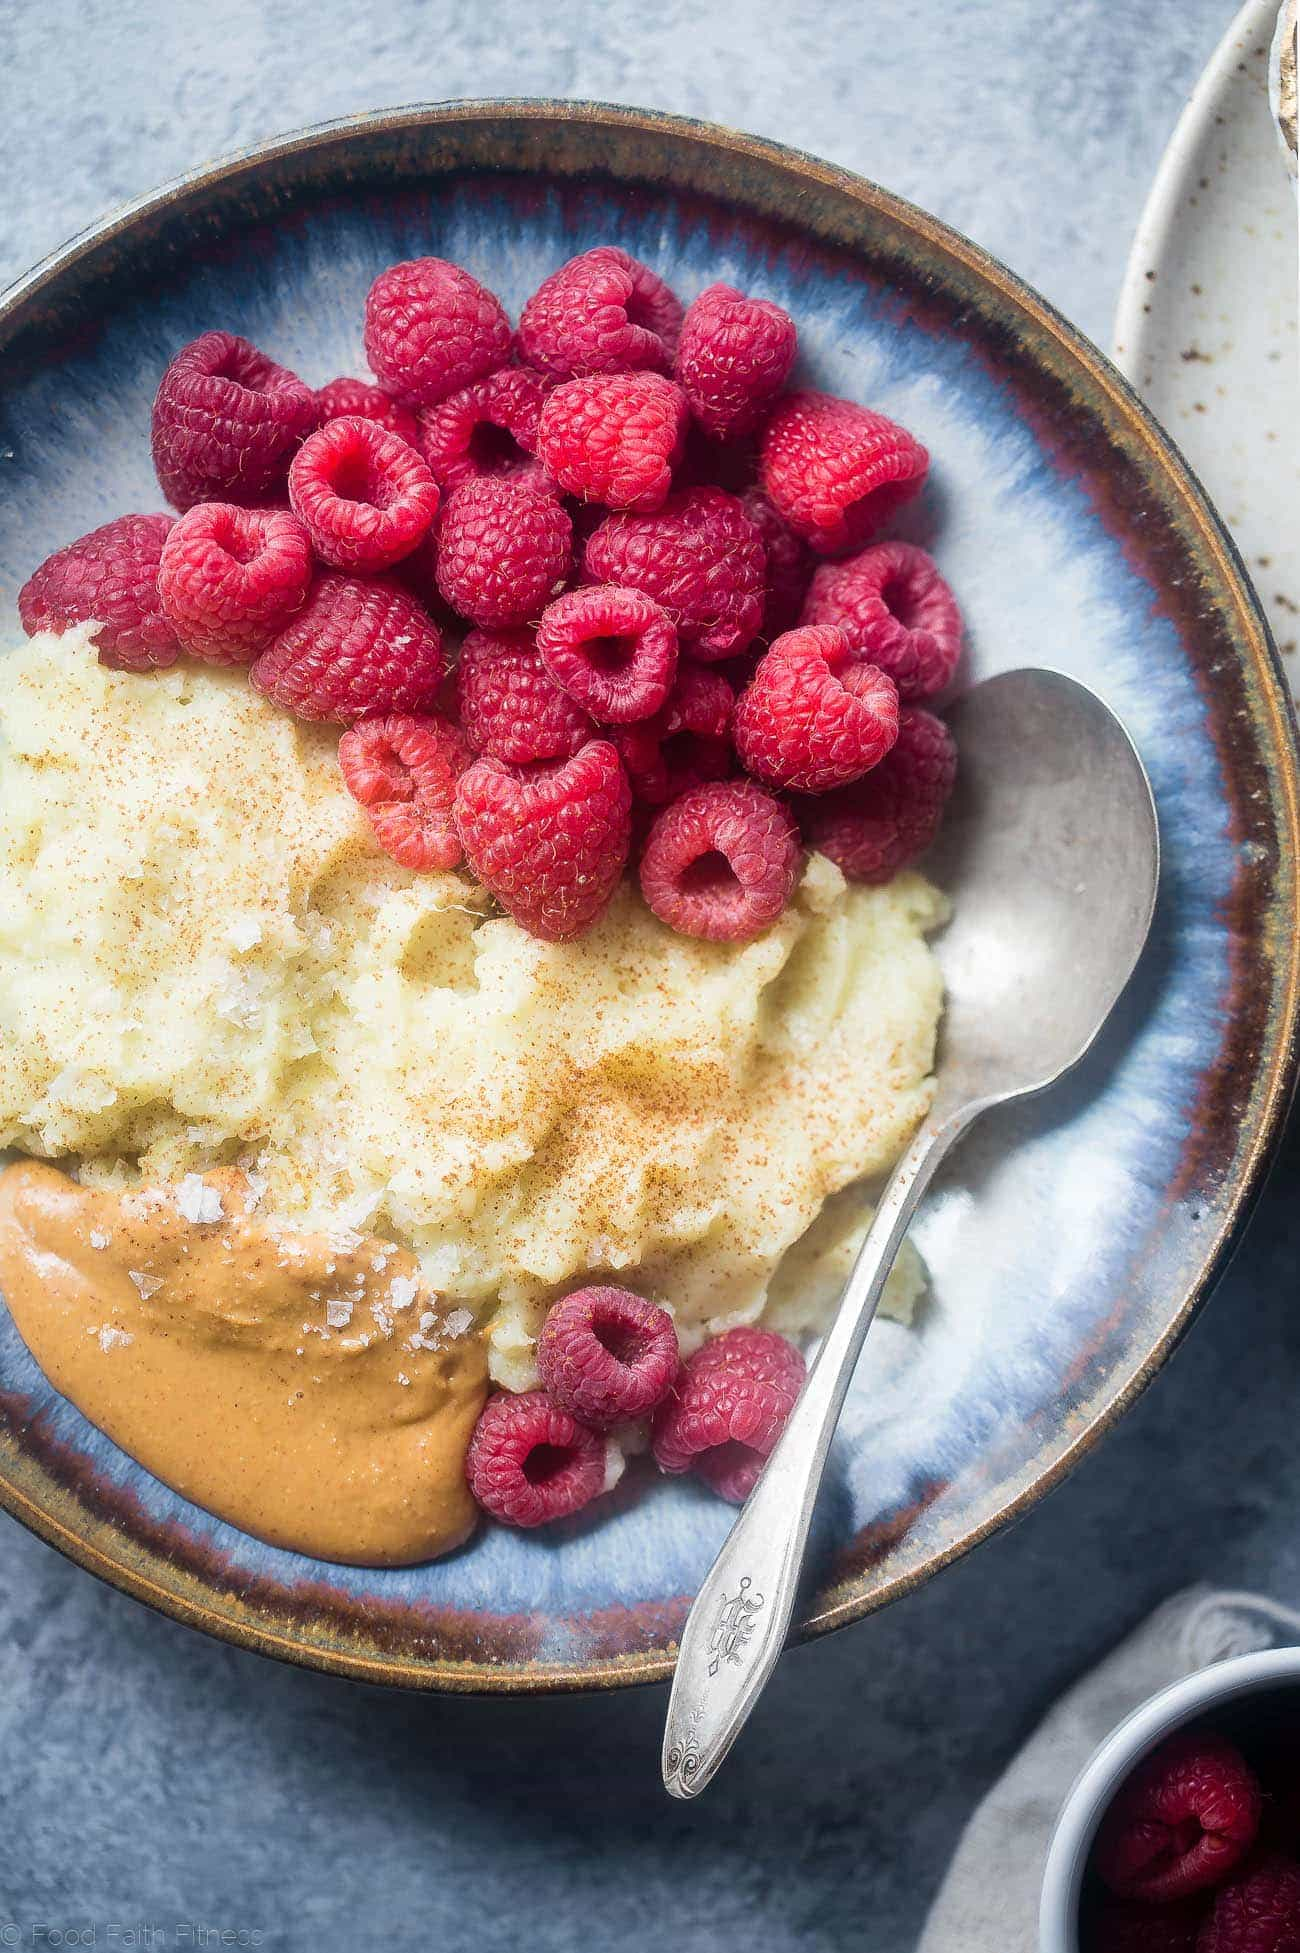 PB & J Sweet Potato Breakfast Bowl - This easy, 5 ingredient, paleo and vegan friendly breakfast bowl is a gluten free, whole30 compliant breakfast that is only 200 calories! | Foodfaithfitness.com | @FoodFaithFit